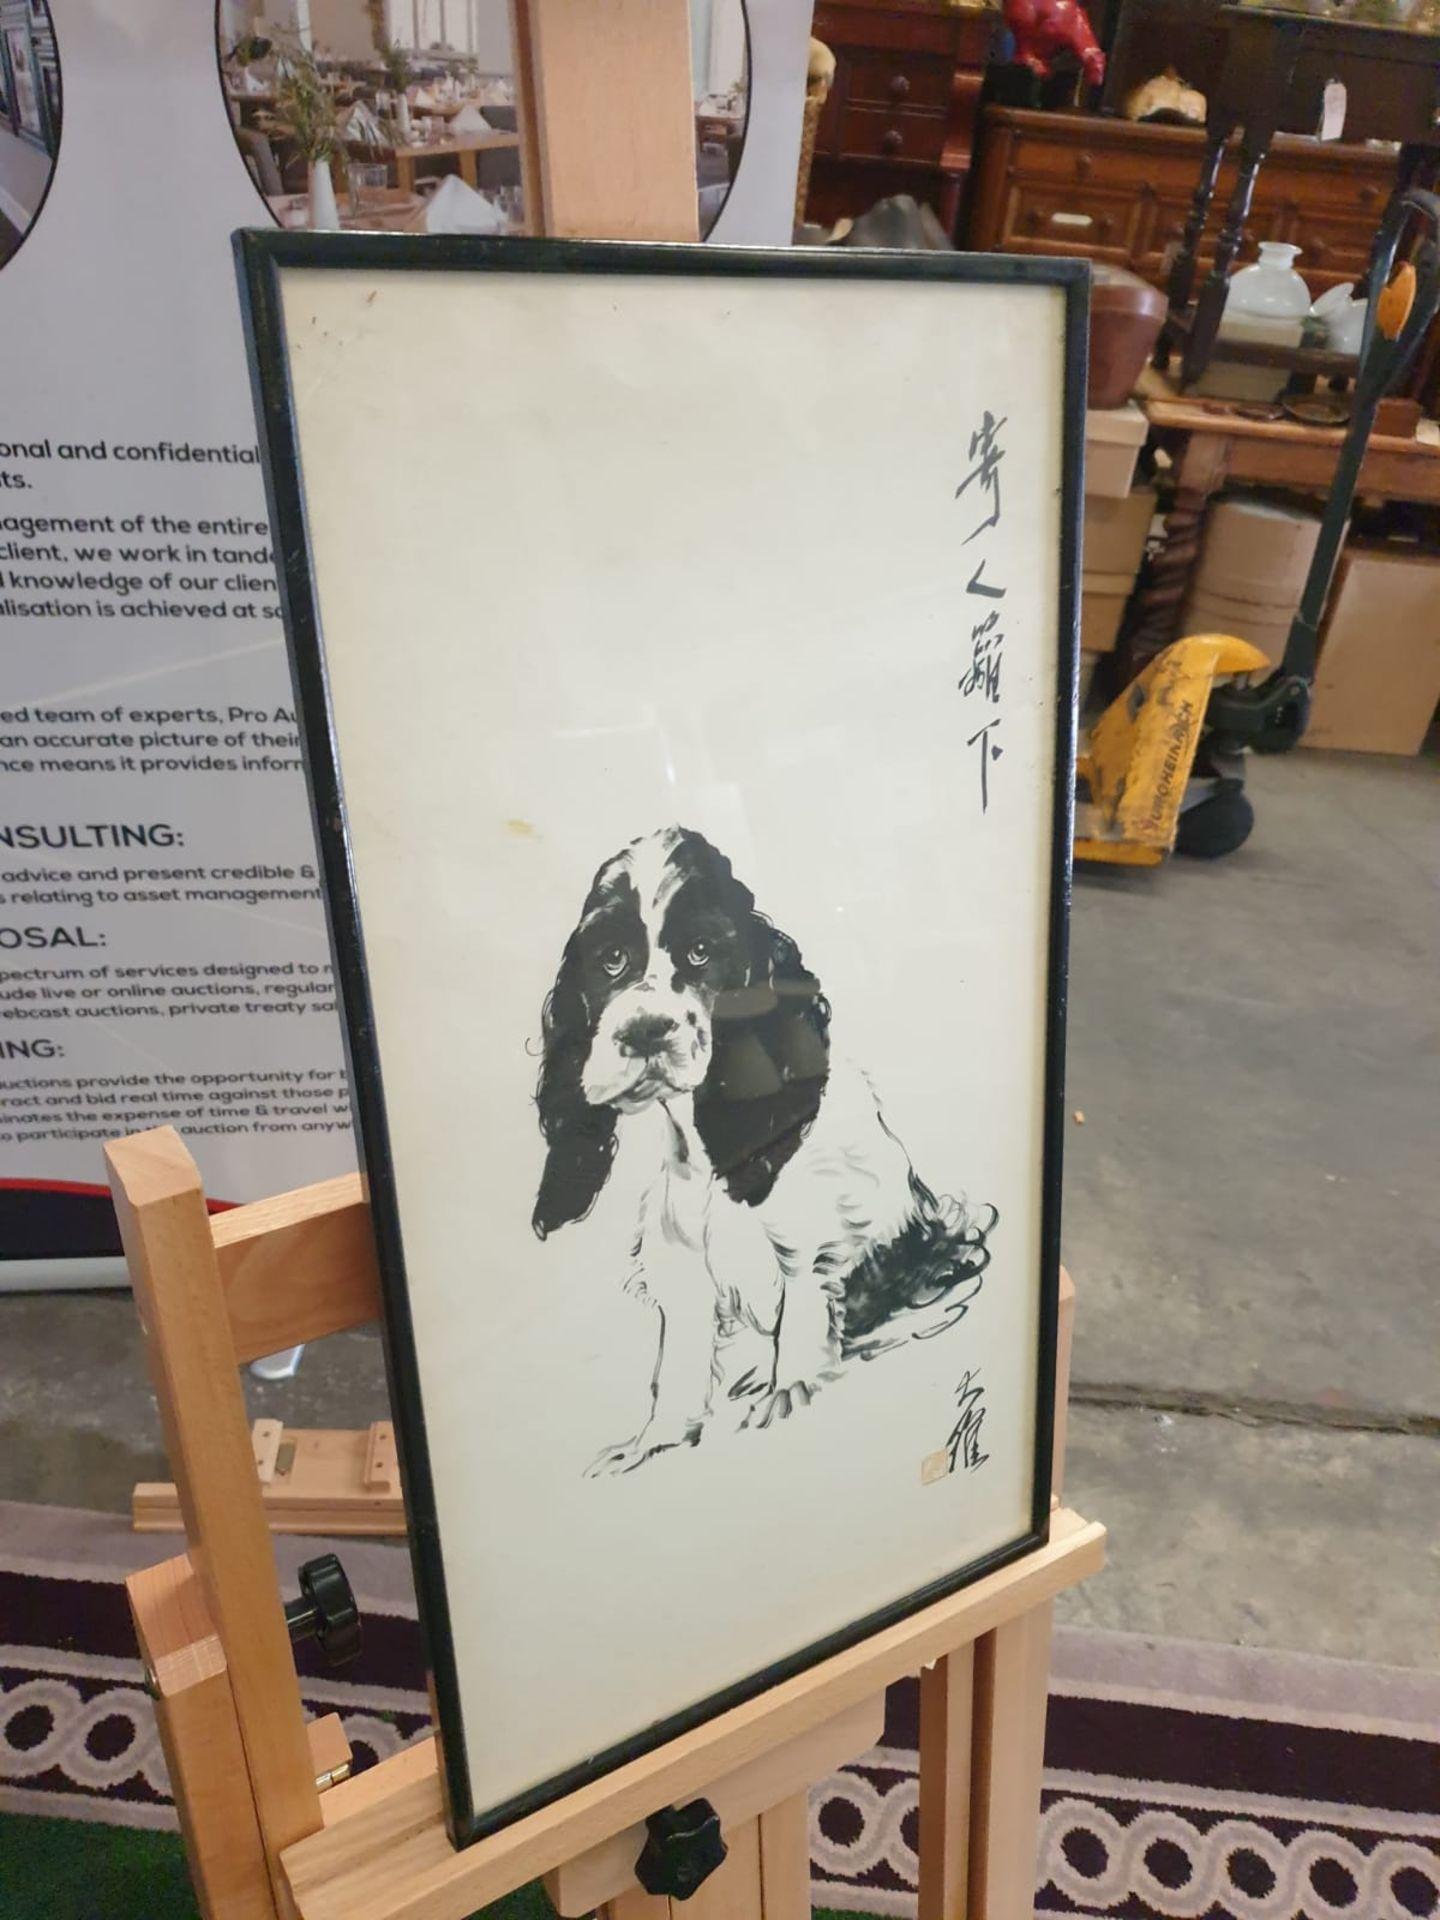 David Kwo Da-Wei (1919-2003) Chinese Lithographic Print Spaniel Da Wei Kwo, David Kwo 1919-2003 ( - Image 3 of 4